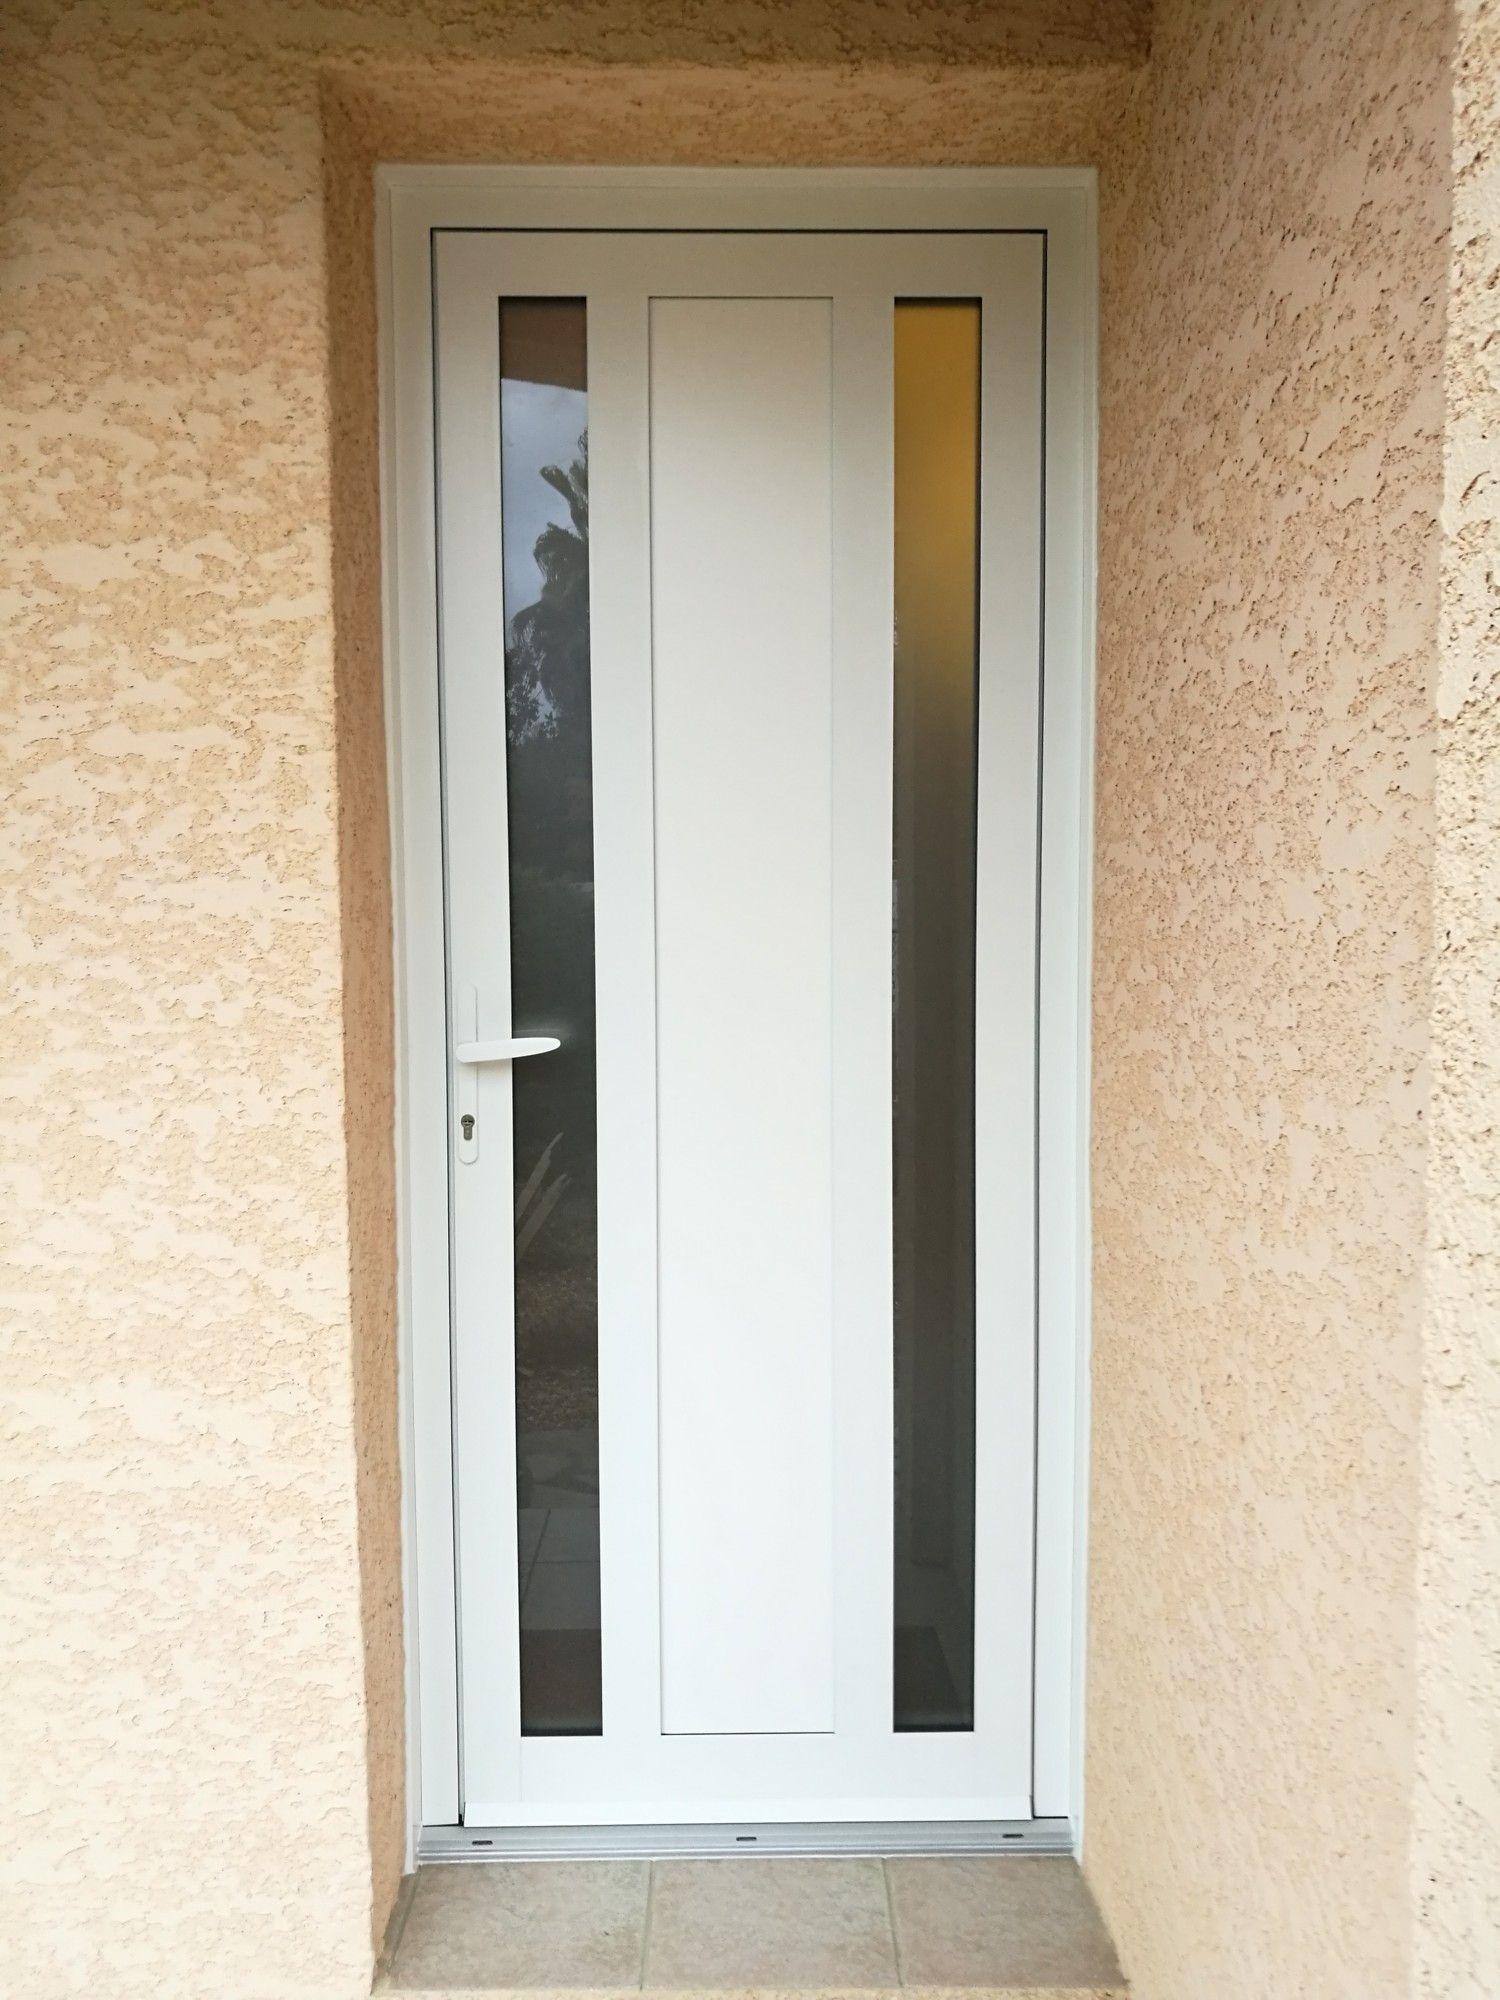 Porte D Entree Creole Aluminium Blanc Yahoo Image Search Results Home Home Decor Decor